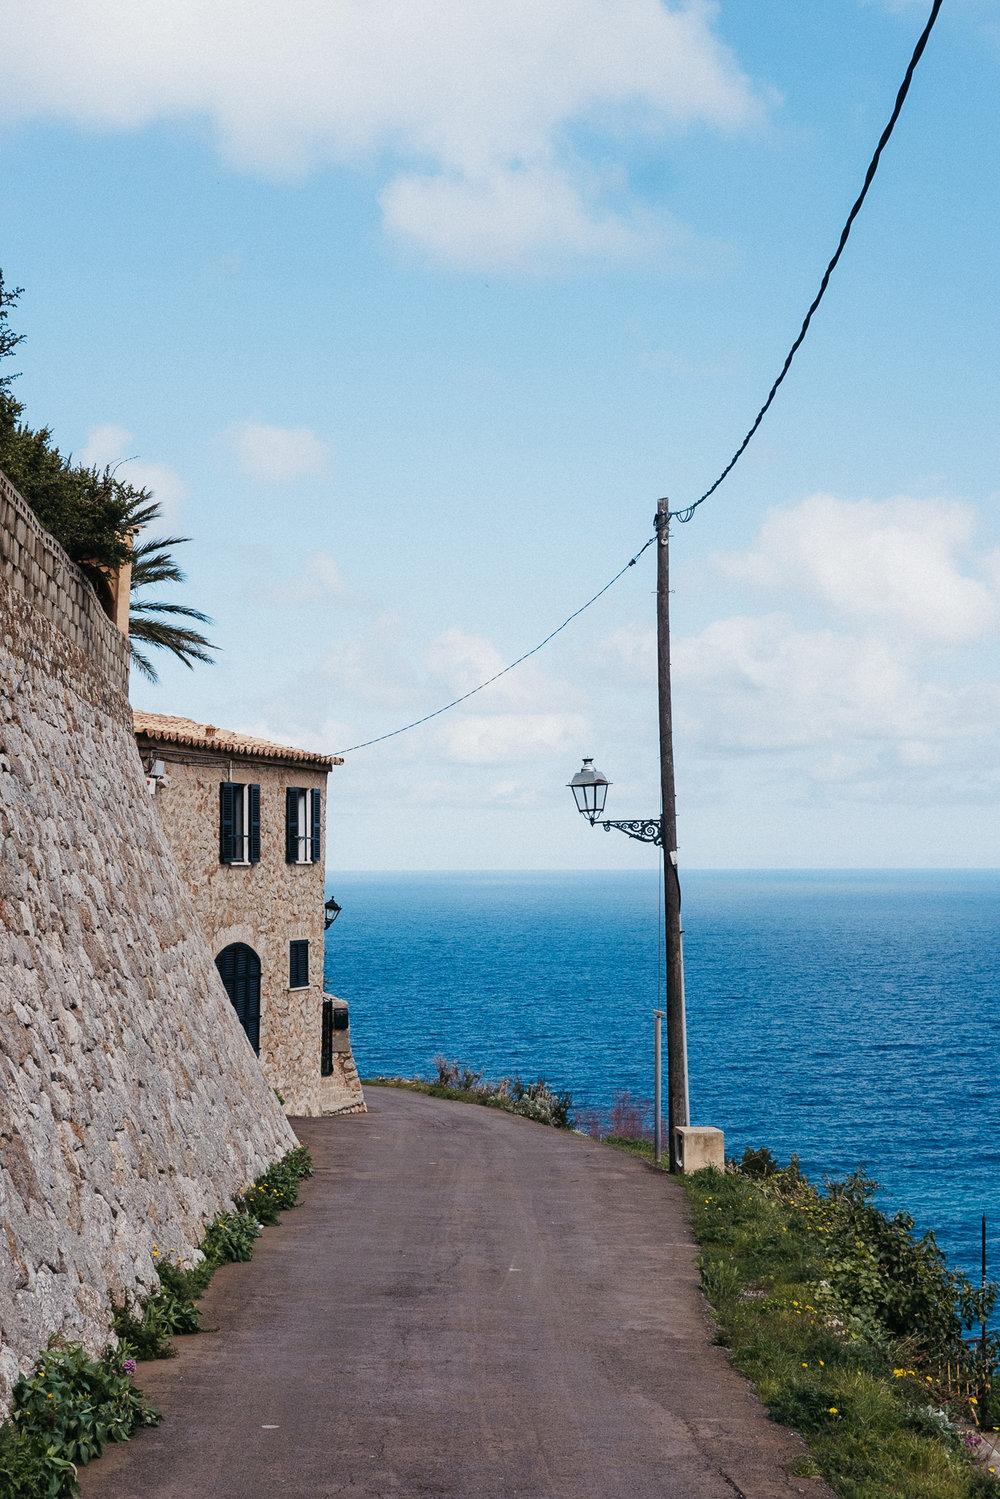 Fototagebuch_Mallorca_180326_031.jpg